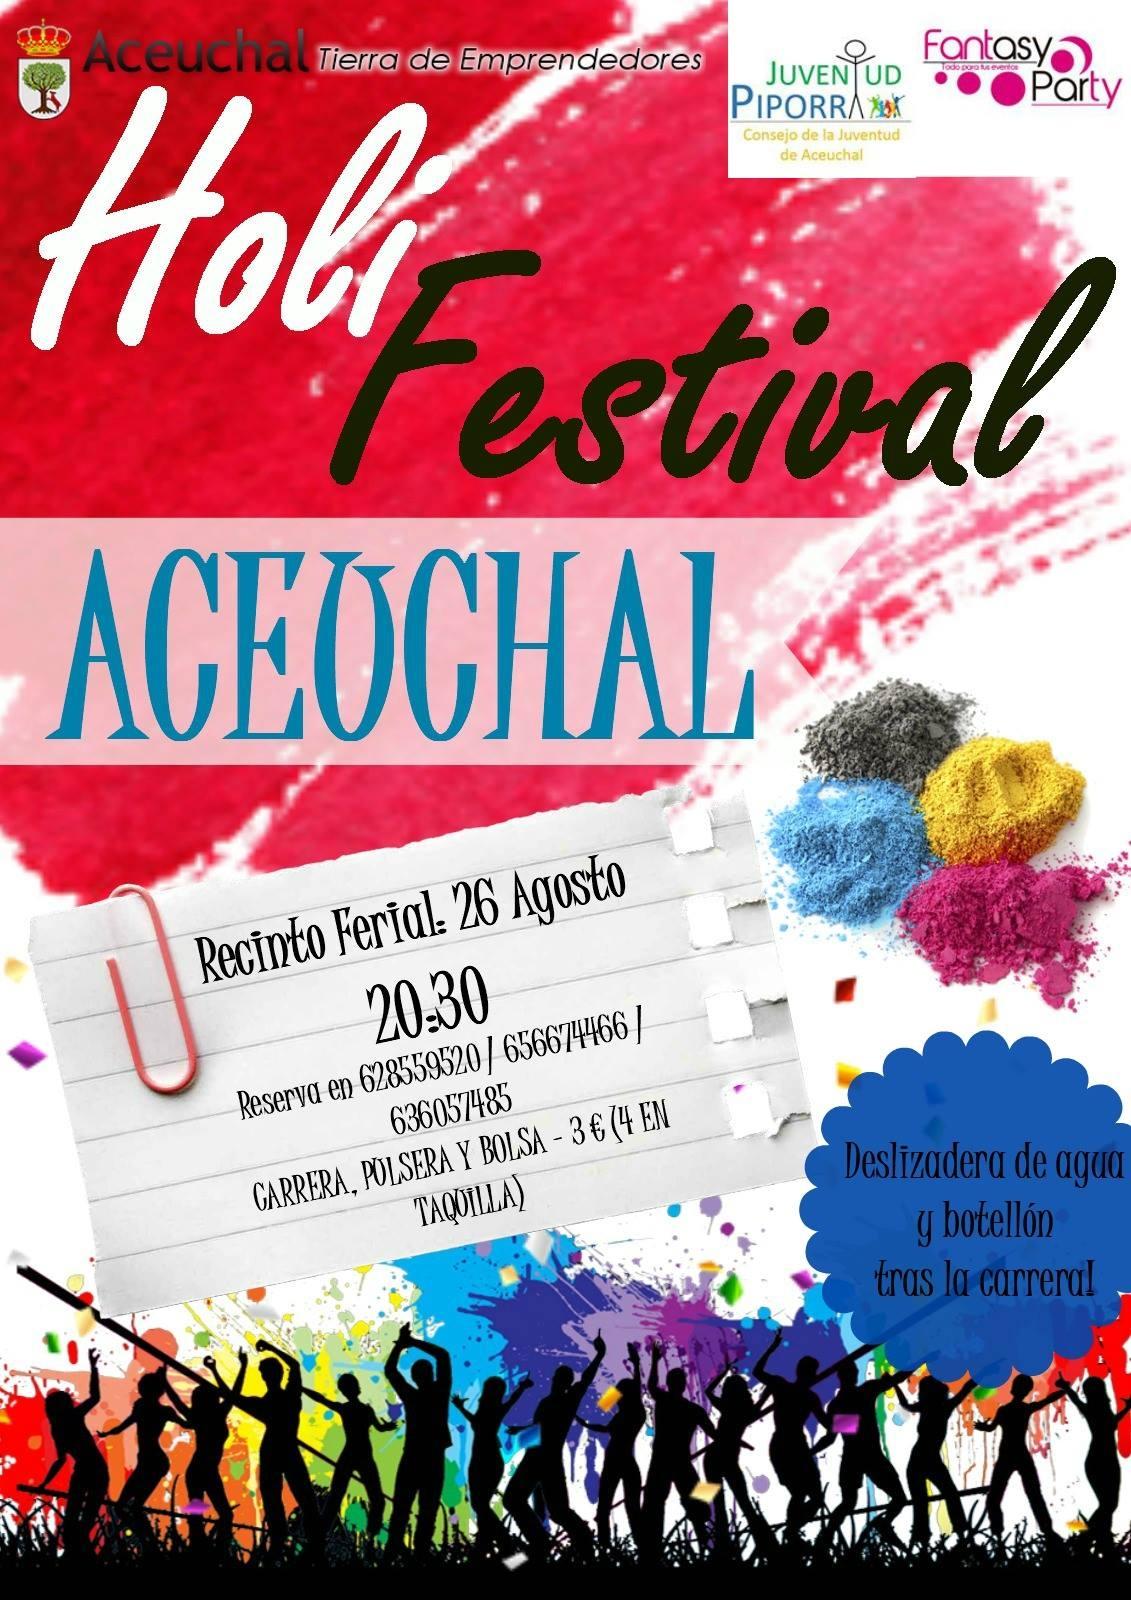 Holi Festival en Aceuchal